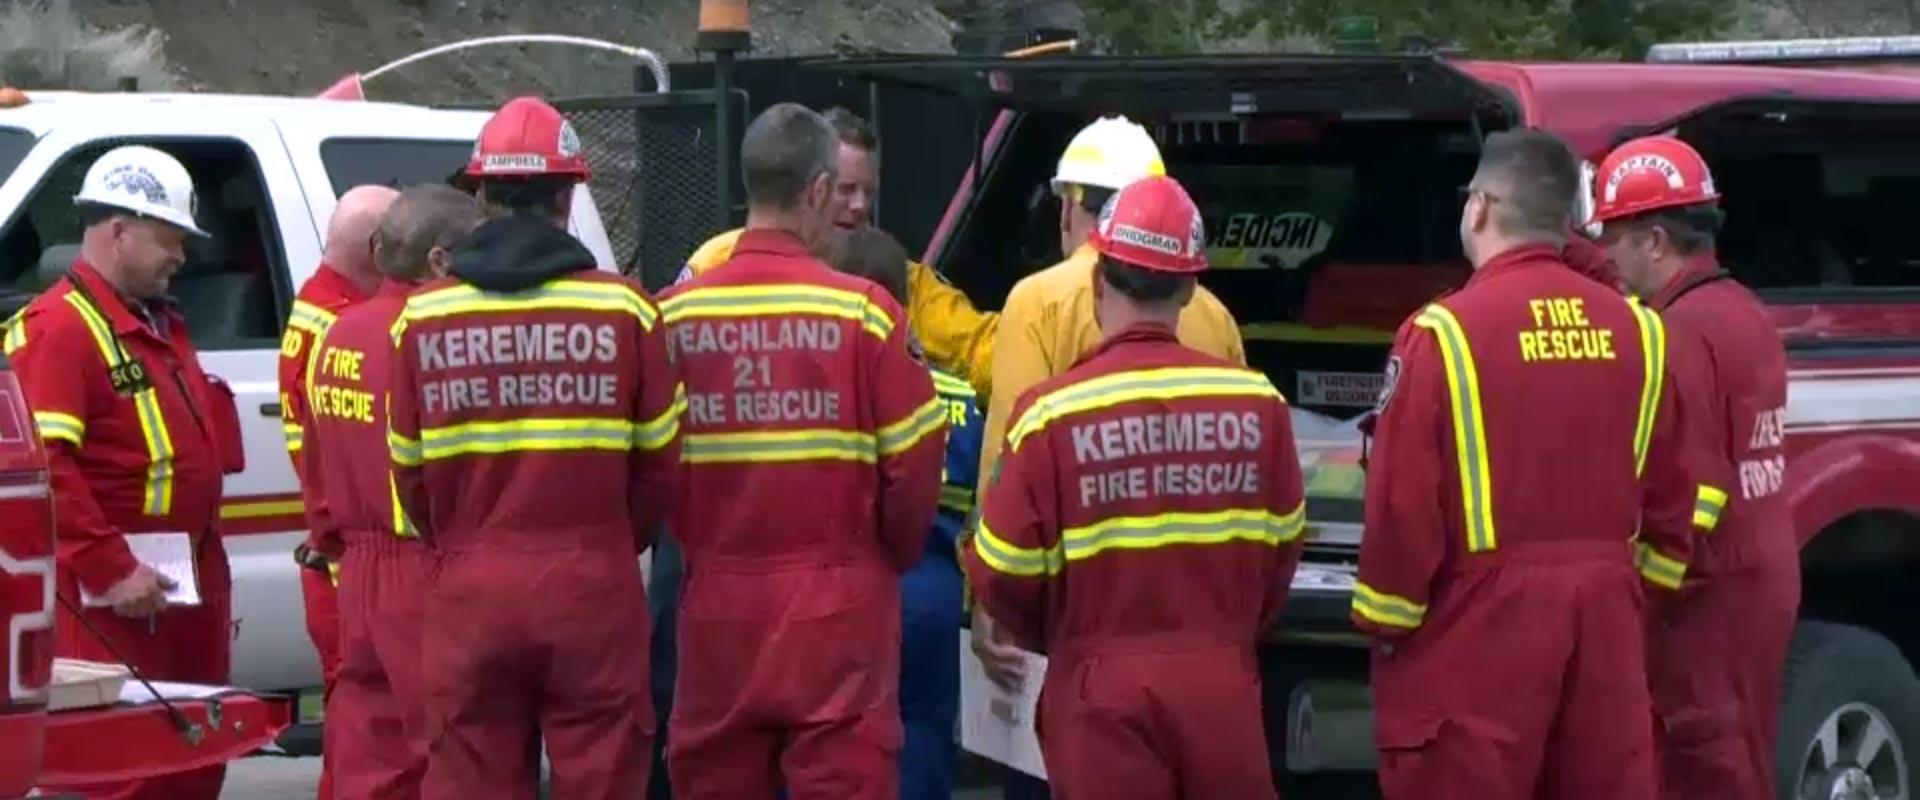 Firefighters Prepare Near Penticton for Summer Wildfire Season